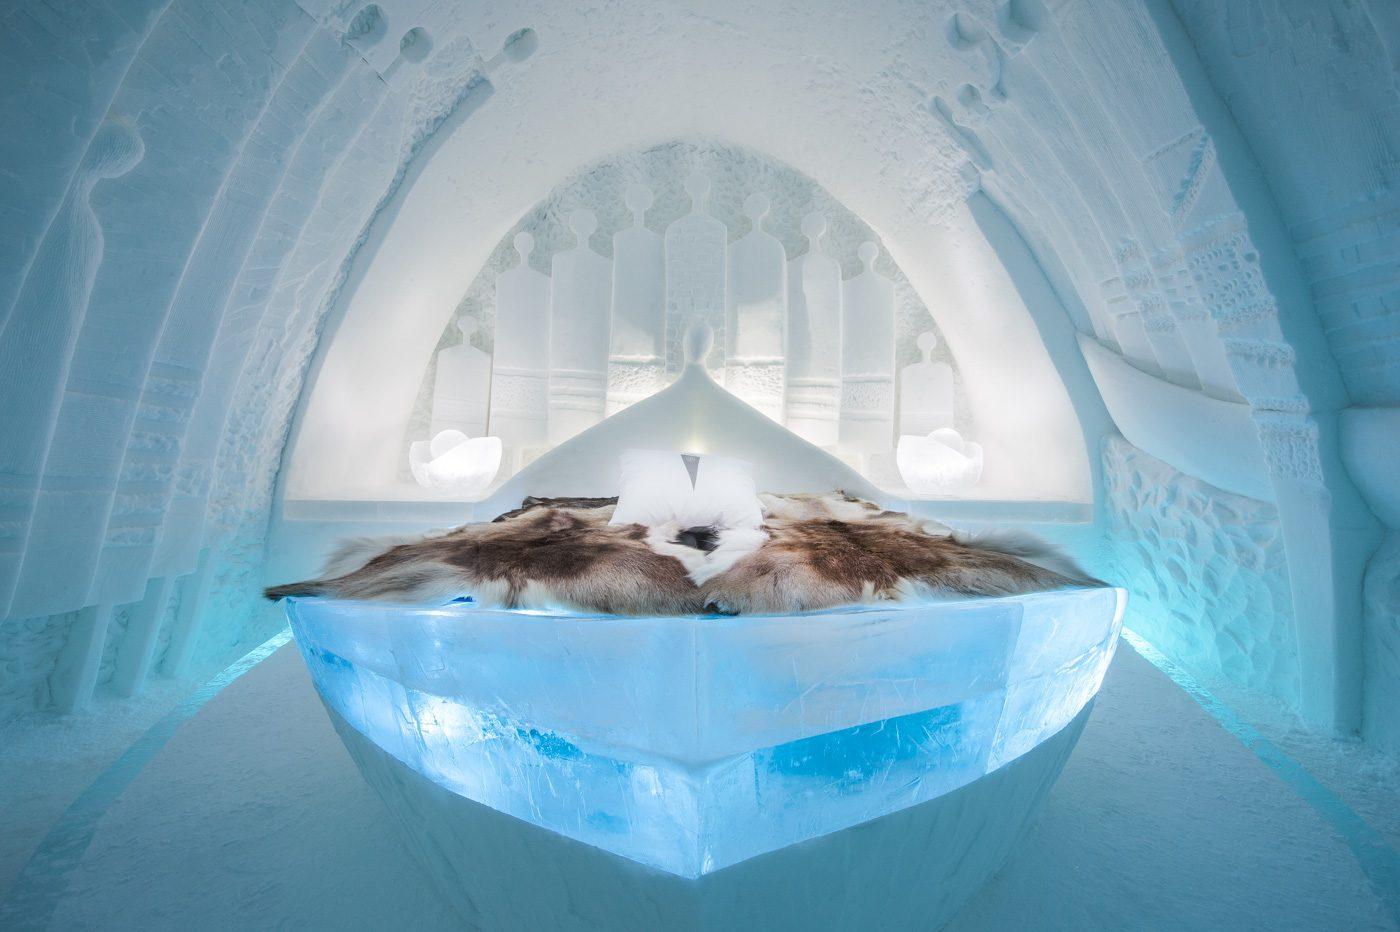 art-suite-daily-travellers-icehotel-28-1400x932.jpg